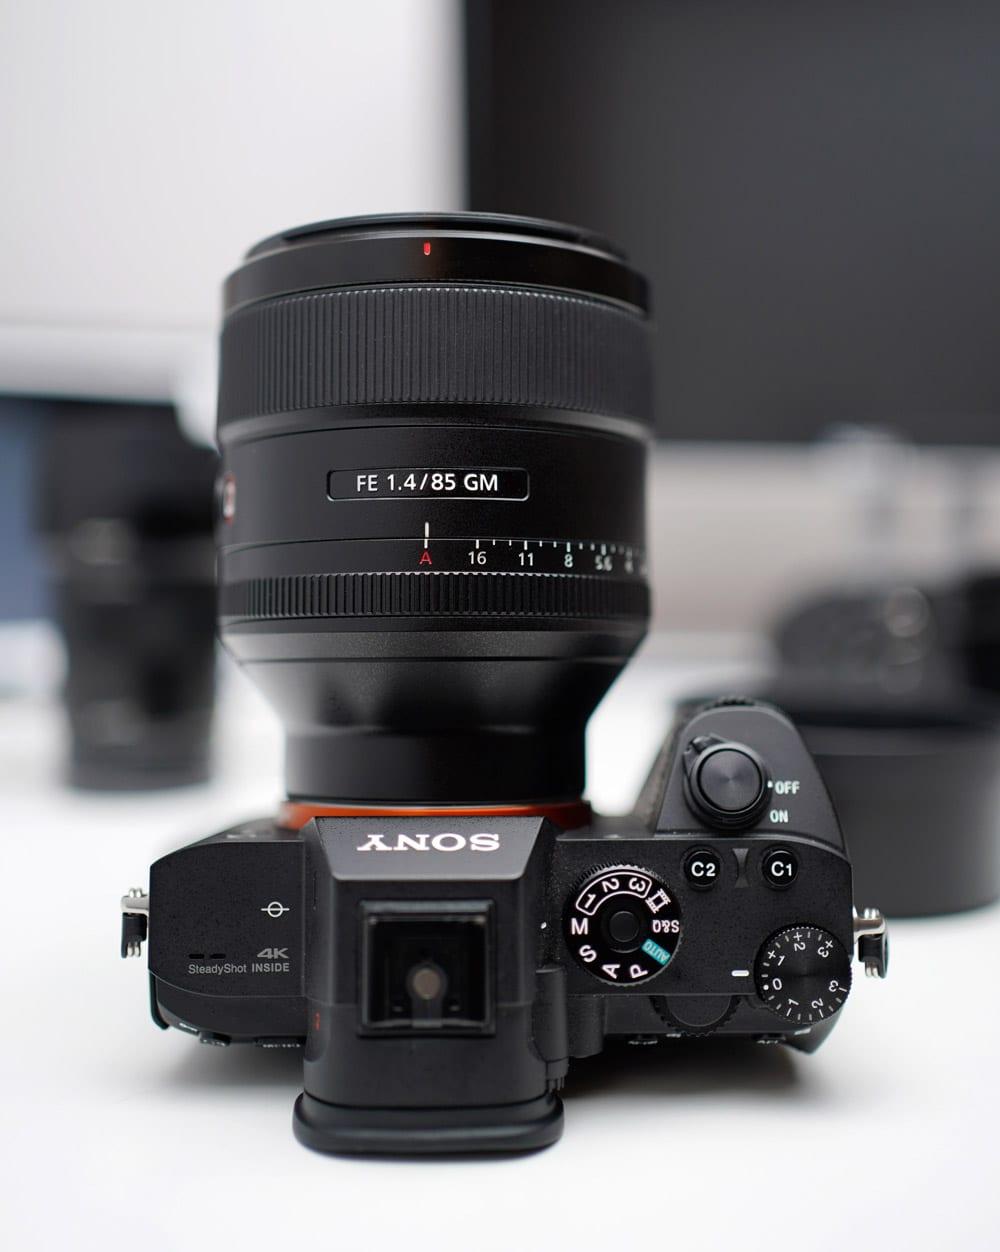 Sony a7riii Sony 85mm GMaster Lens